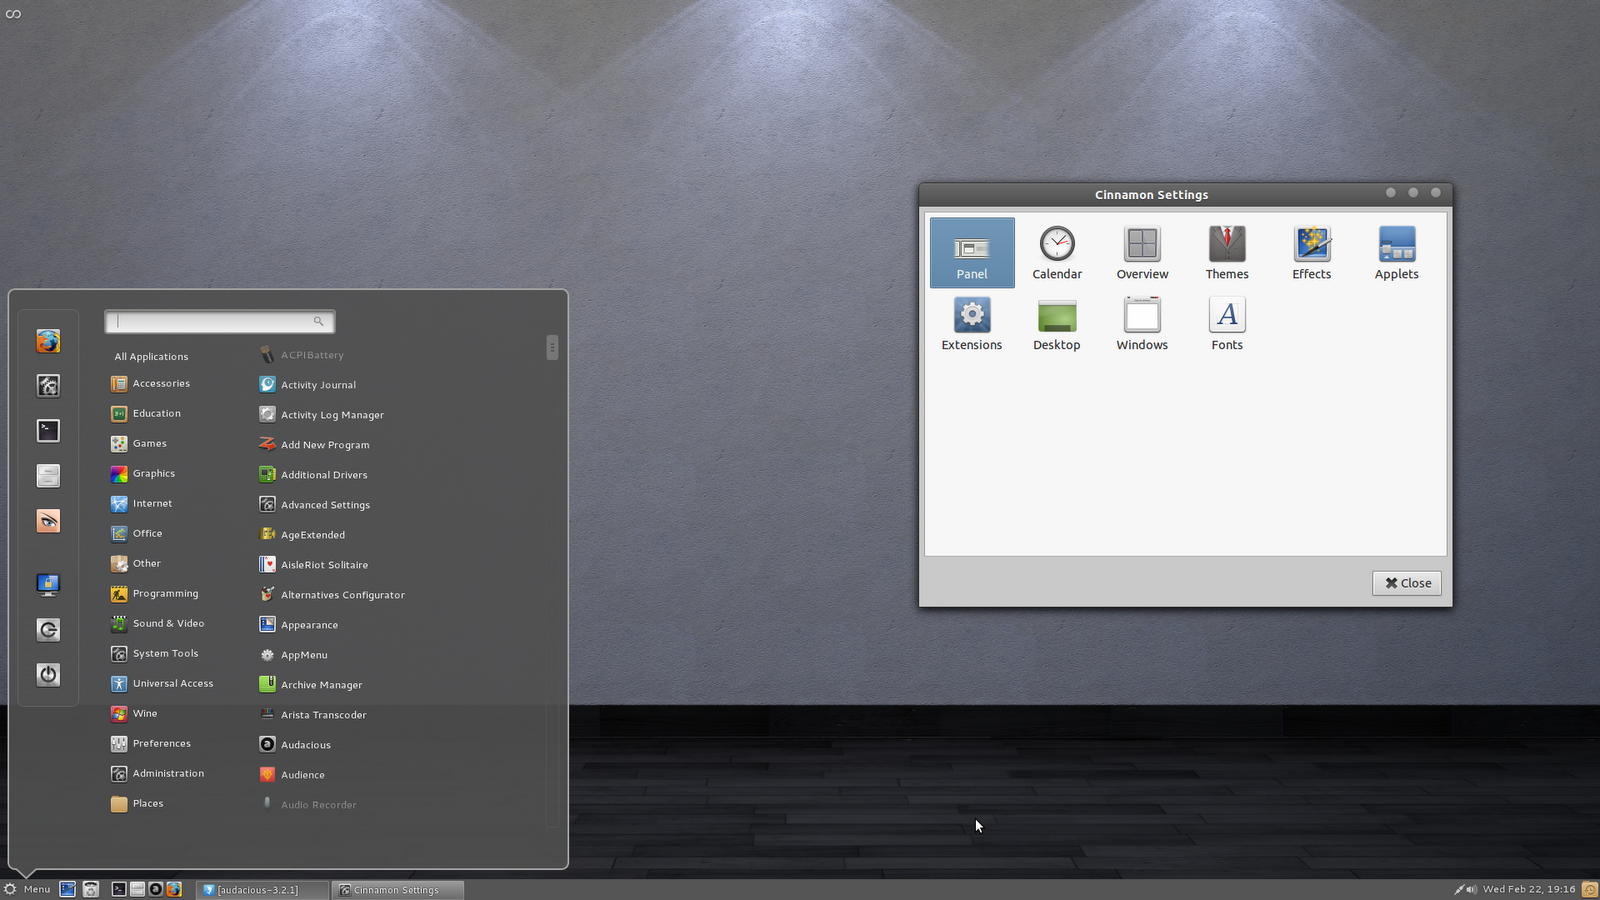 Instalar Cinnamon en Ubuntu 12.04